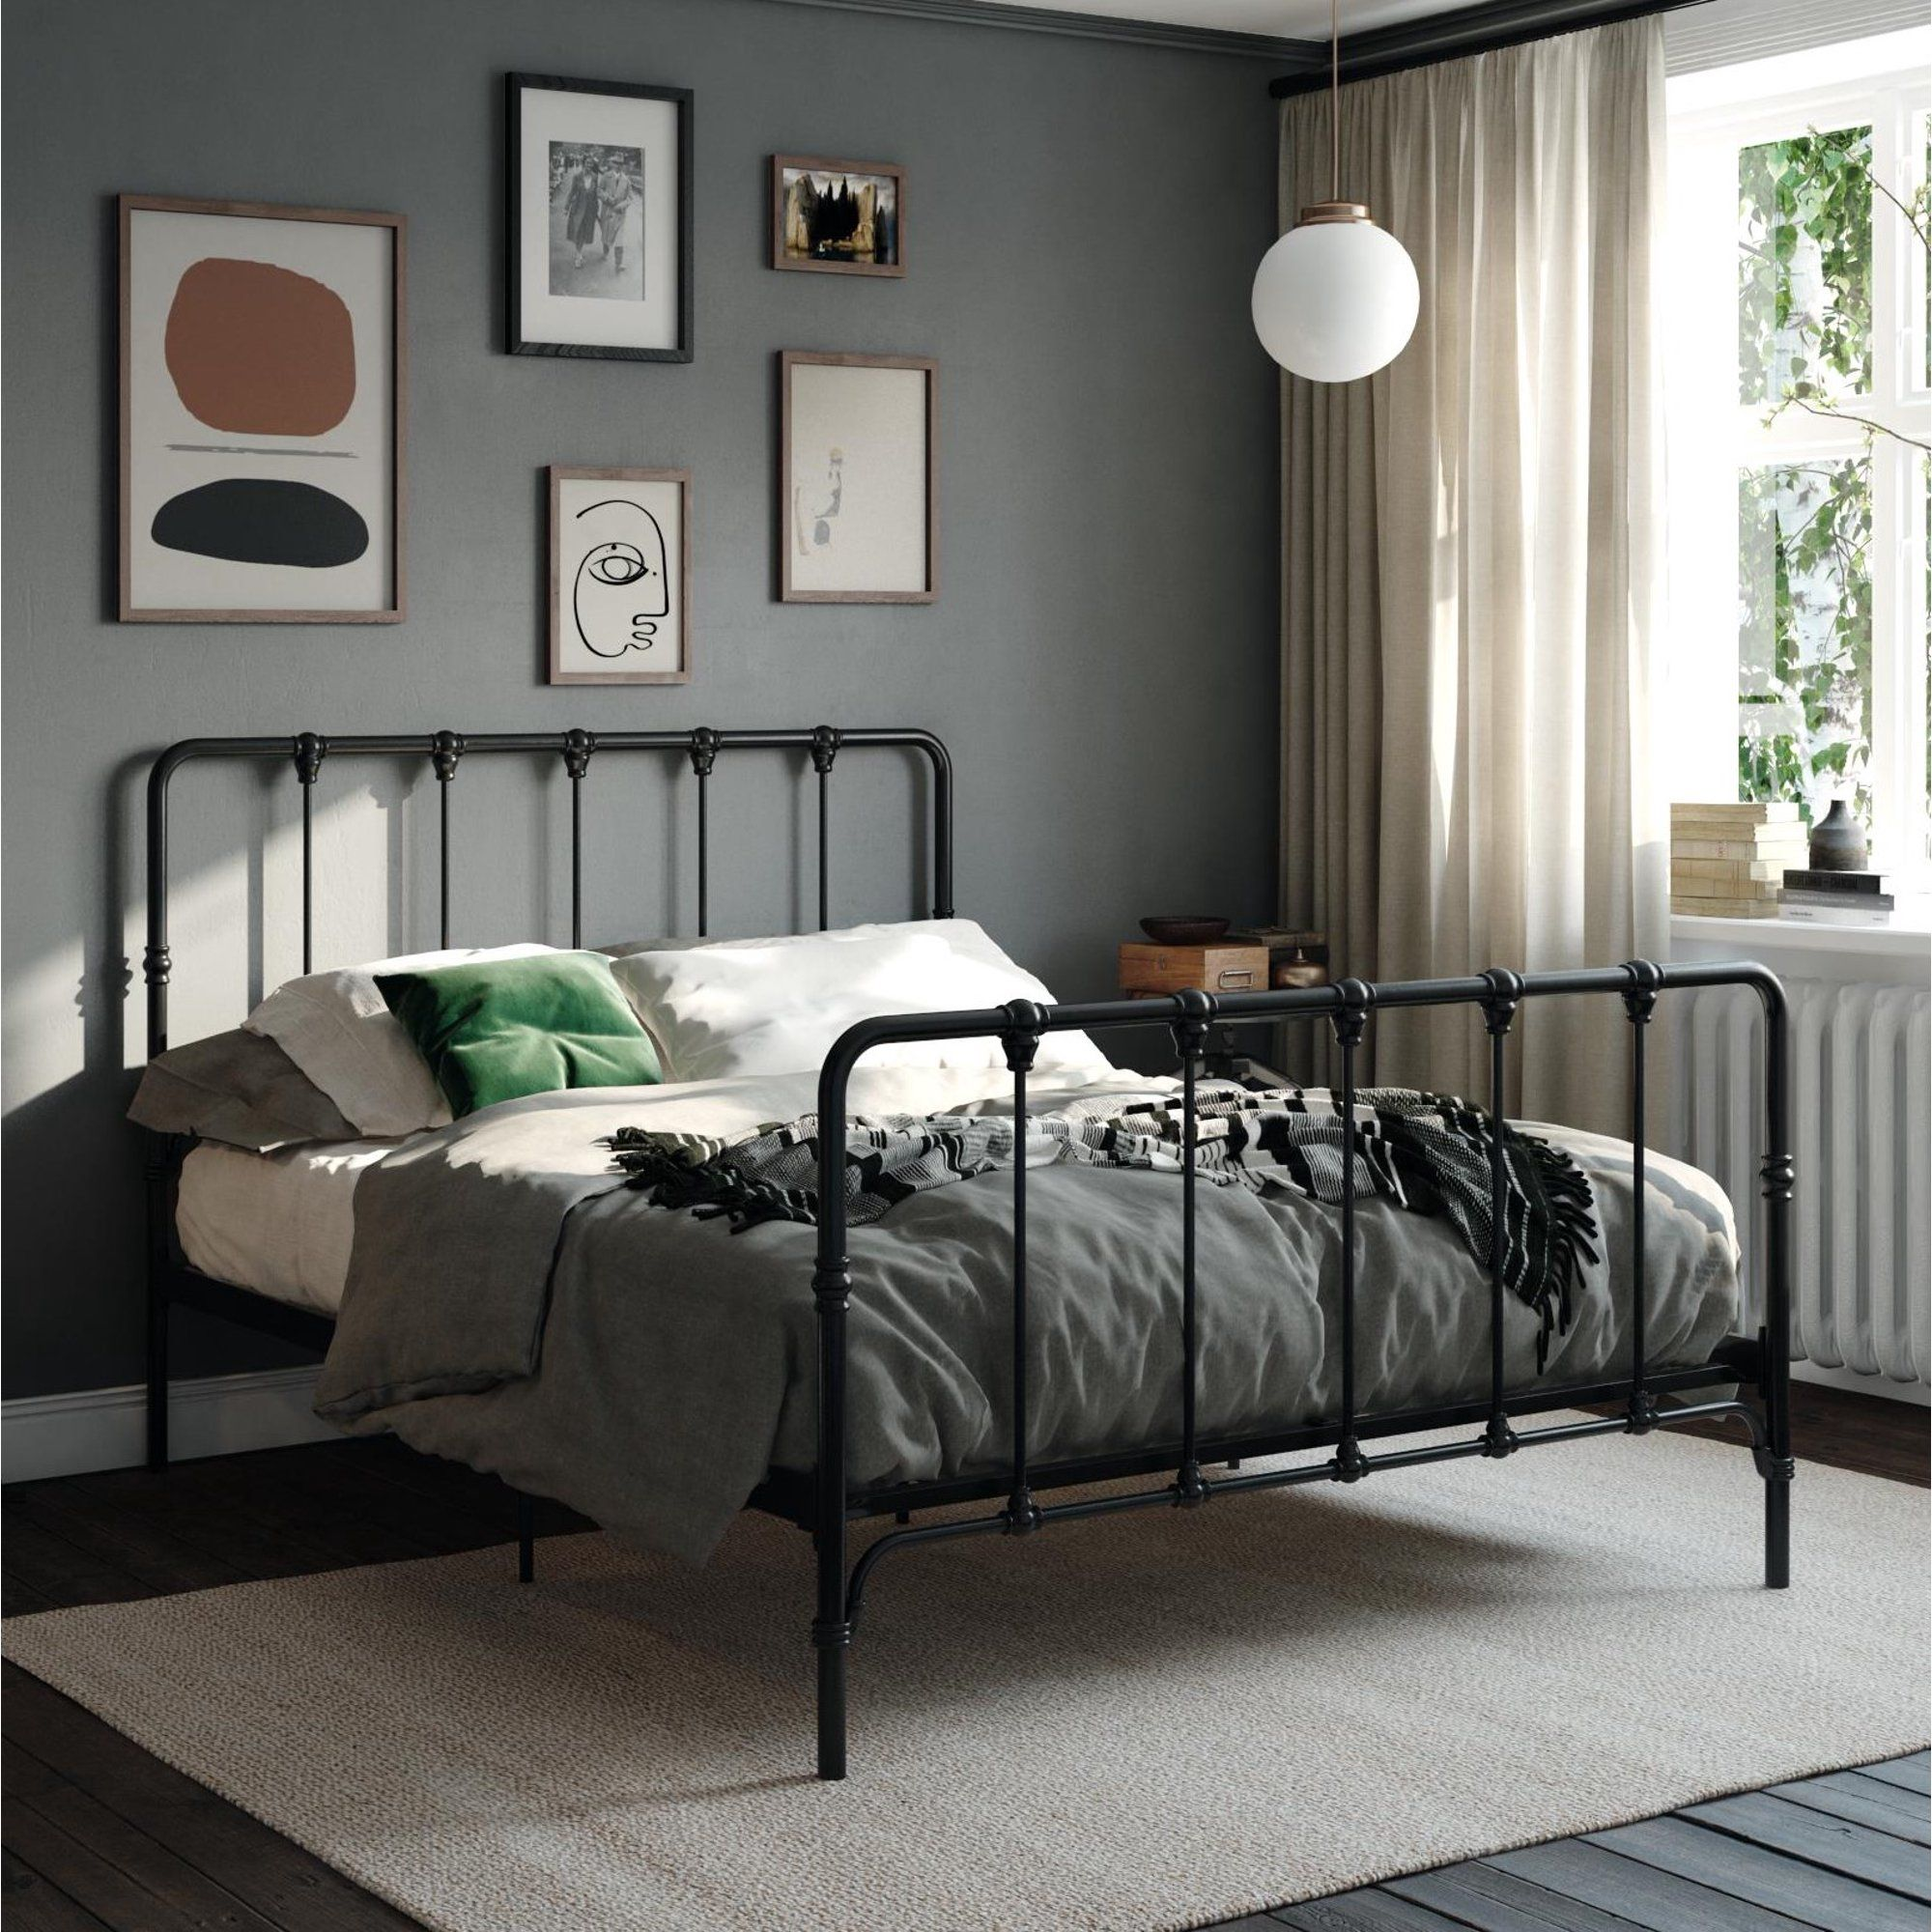 27++ Farmhouse iron bed frame ideas